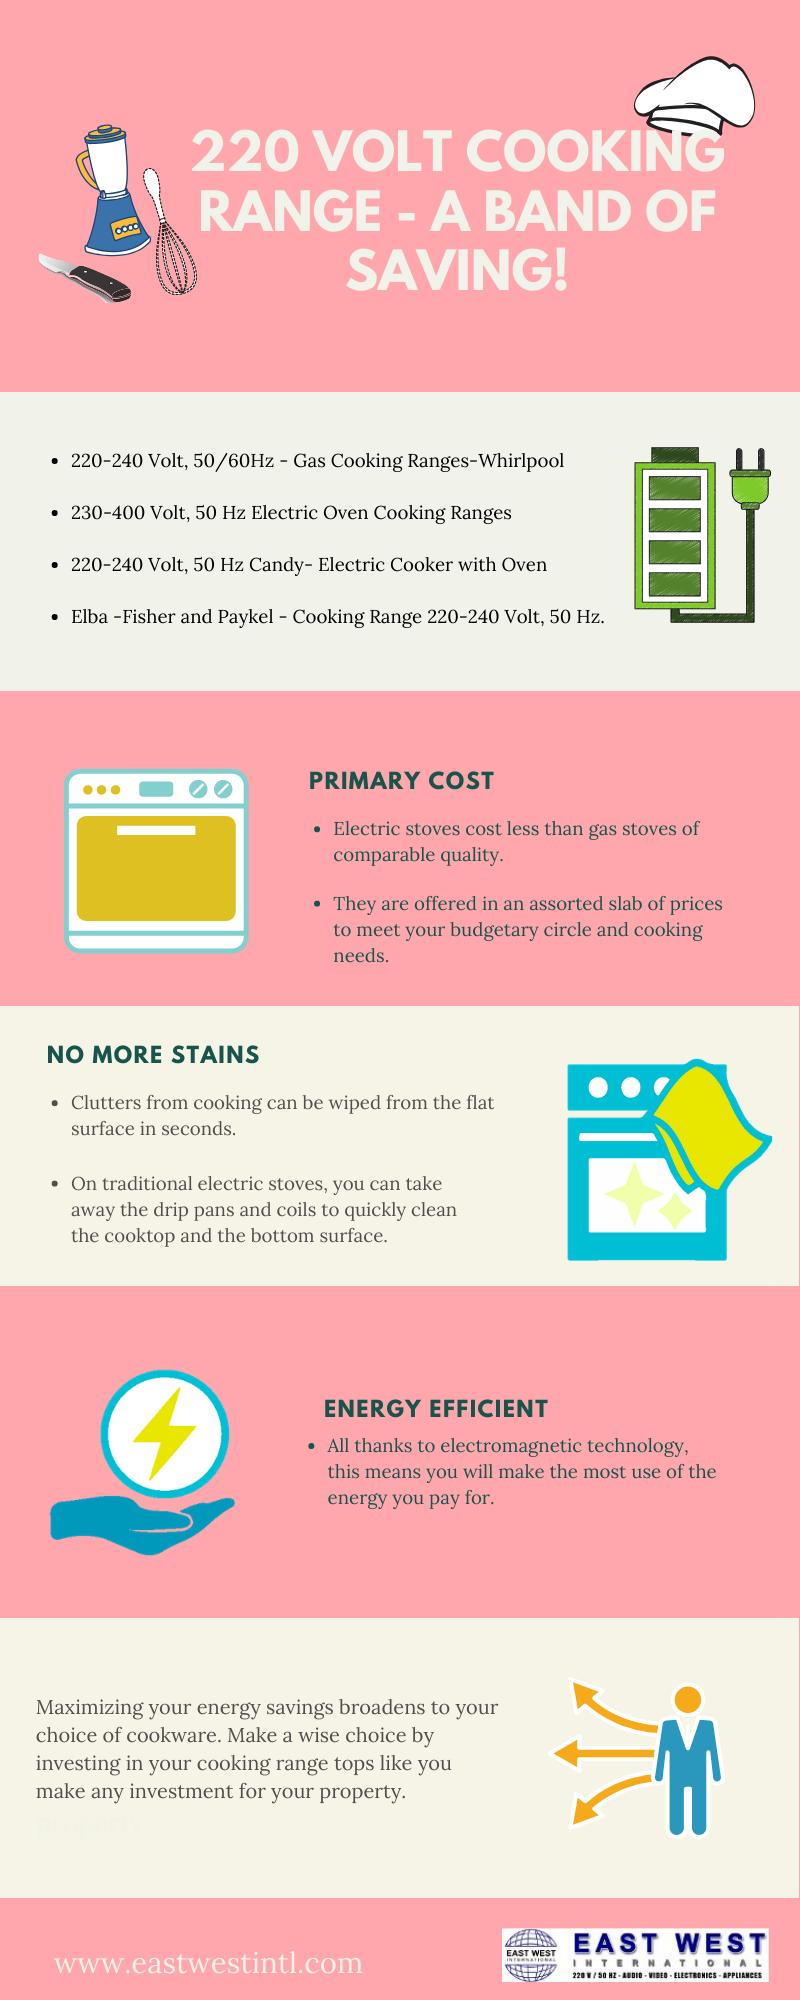 220 Volt Cooking Range - East West International Infographic